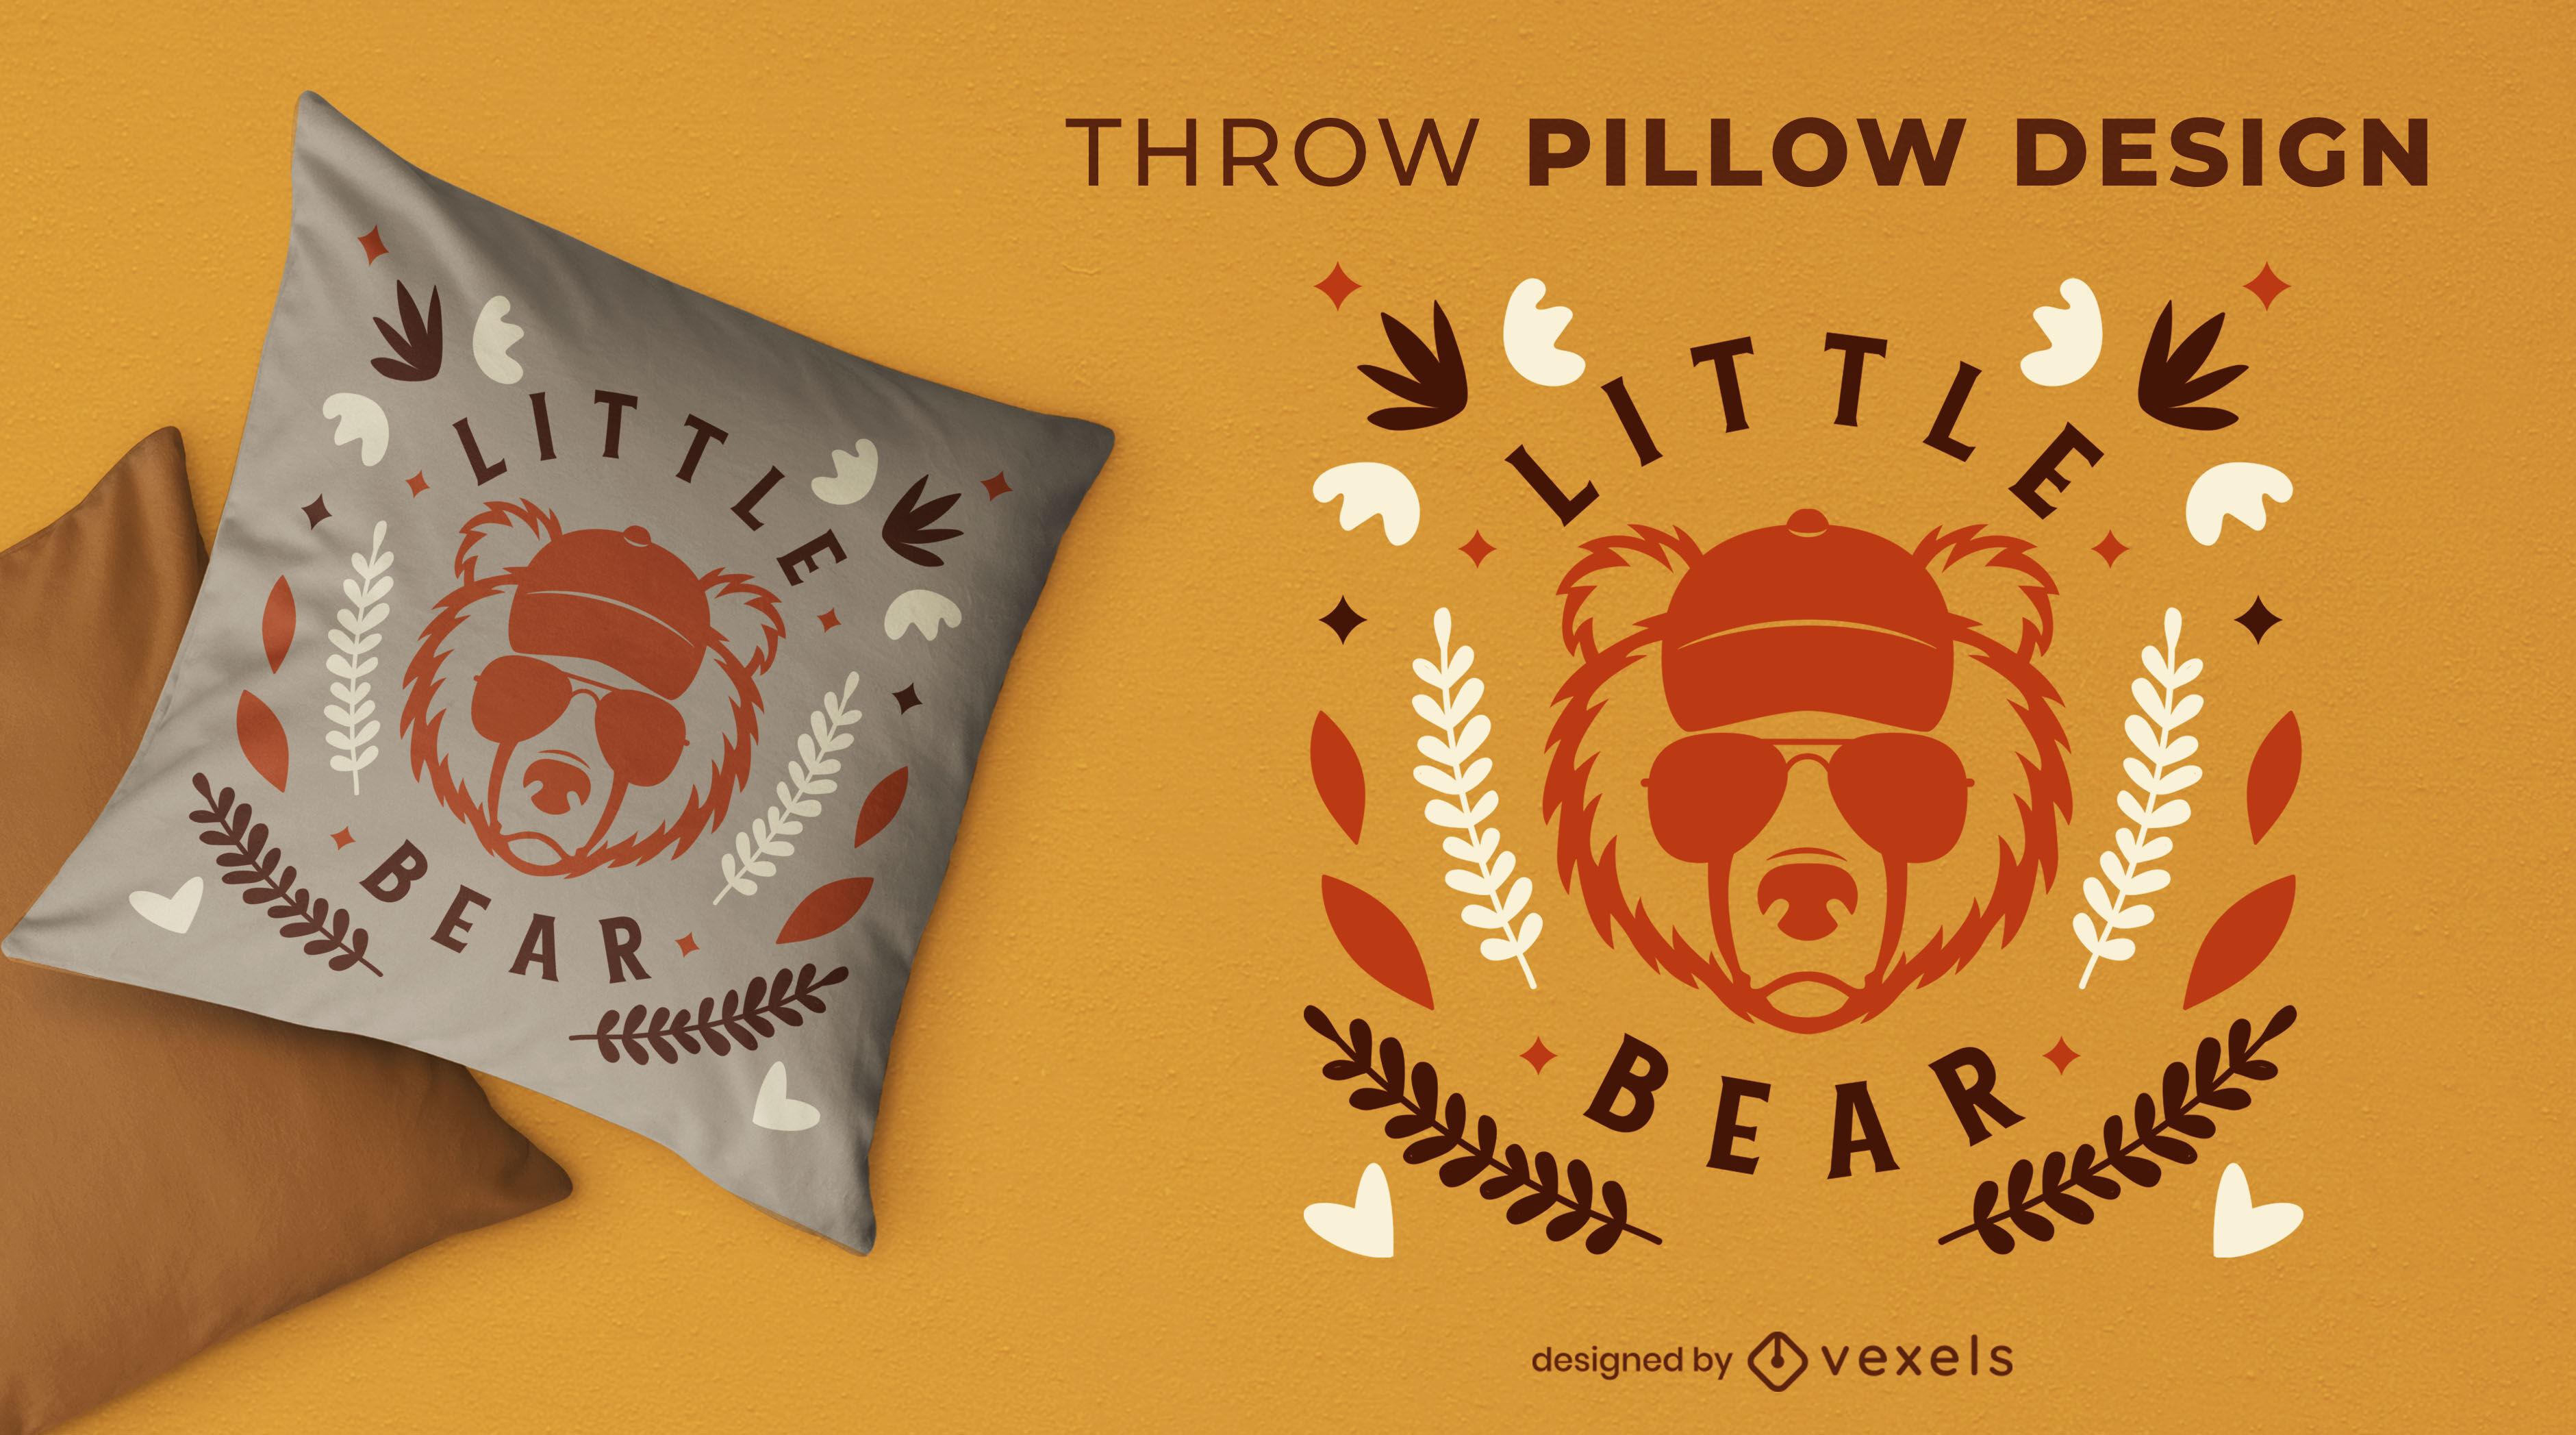 Bear with sunglasses throw pillow design